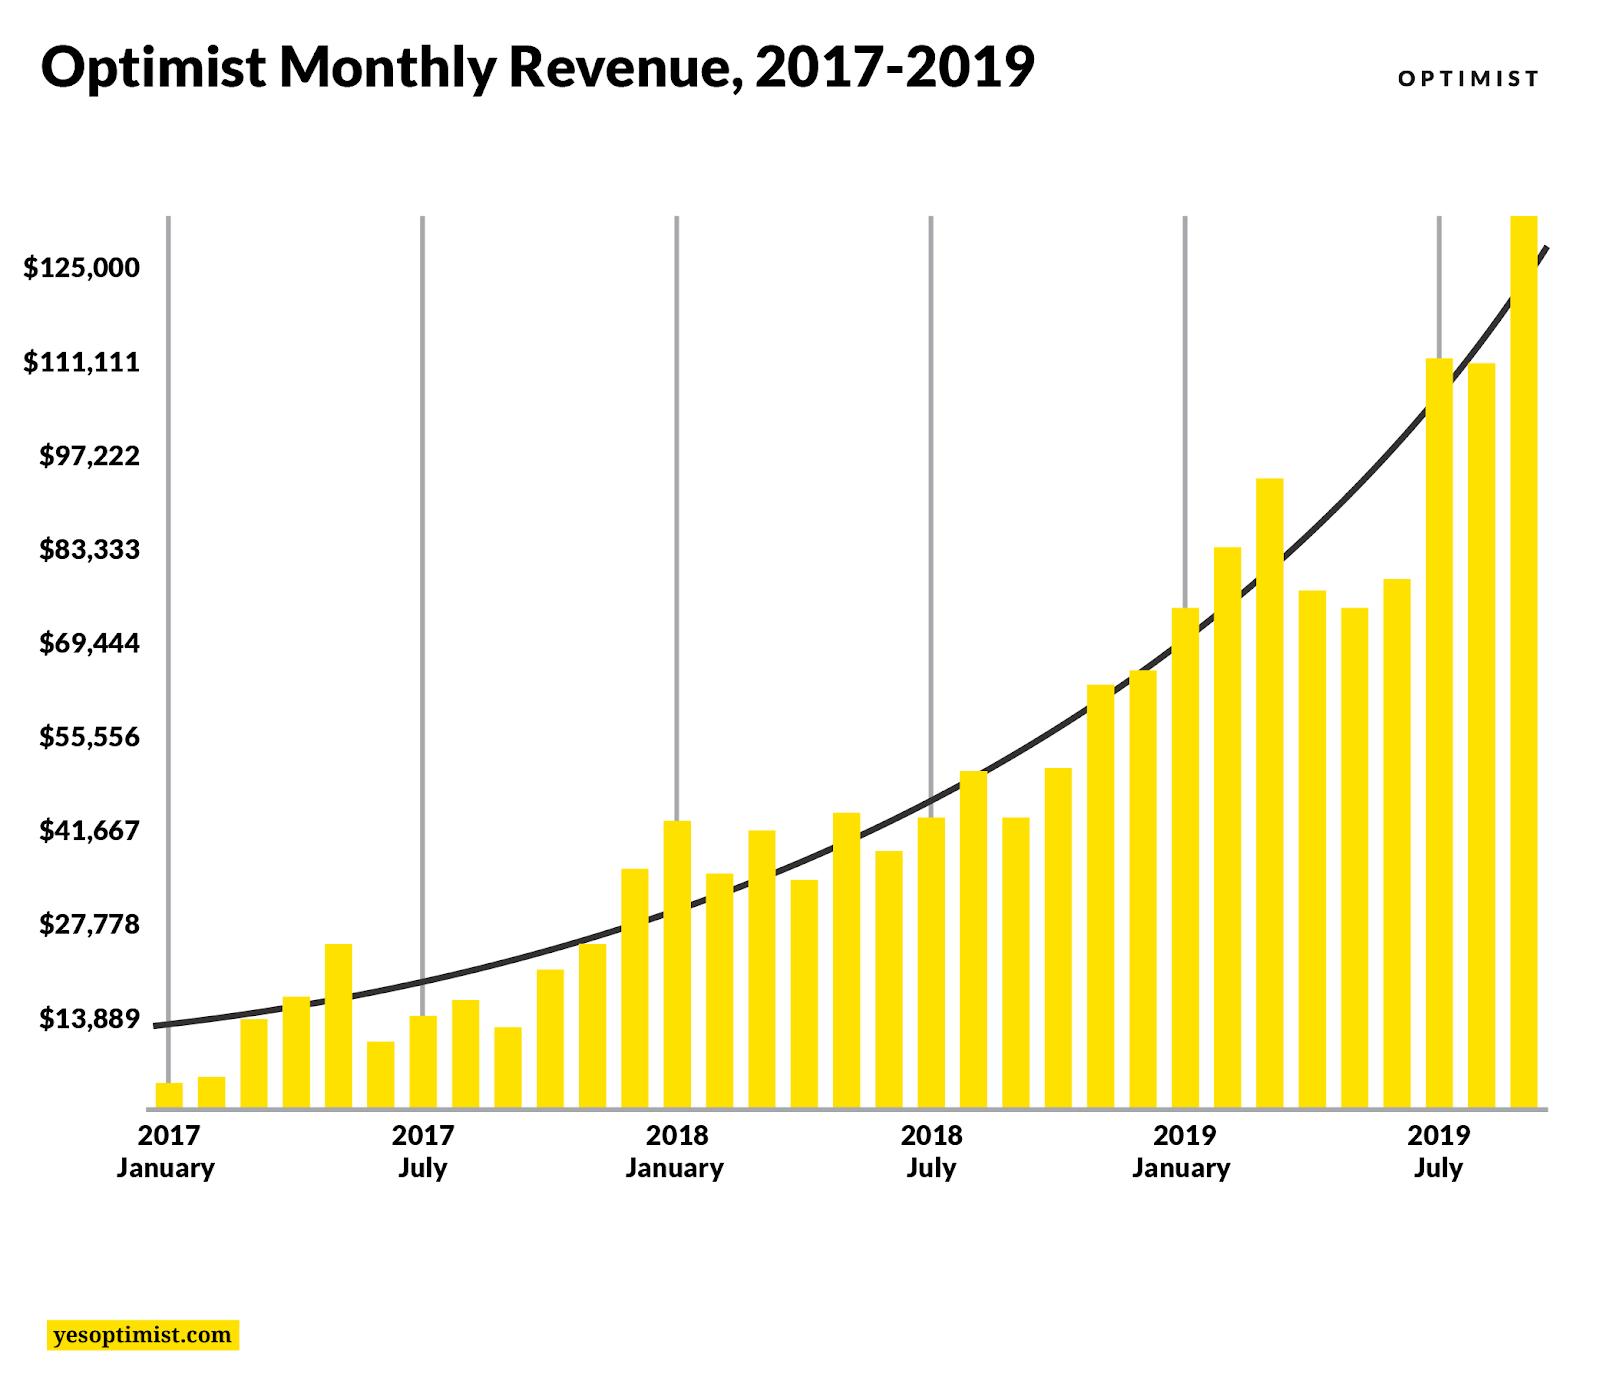 Optimist Monthly Revenue Chat, 2017-2019 by yesoptimist.com